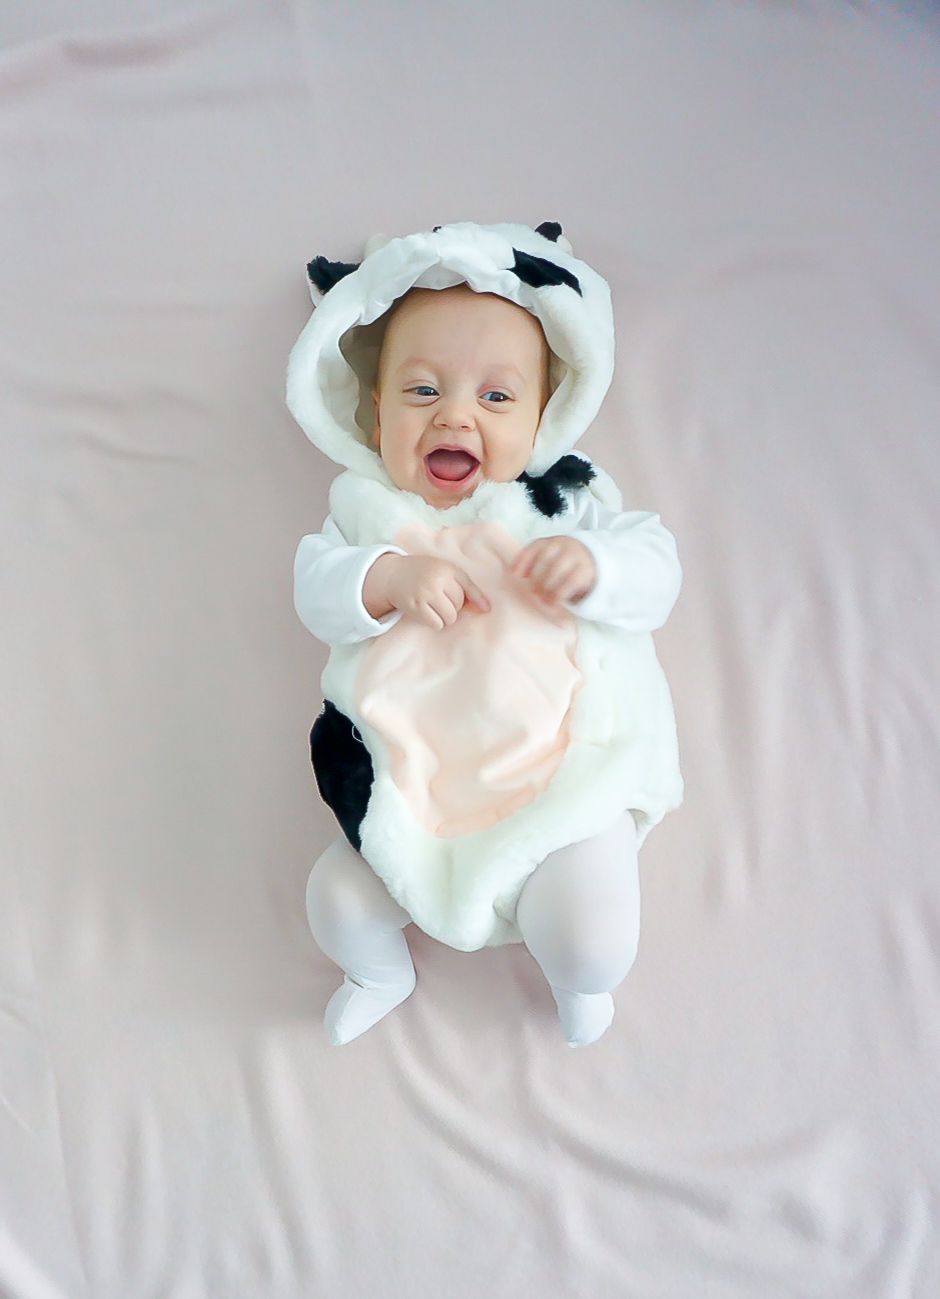 baby girl costume, baby's first Halloween costume, baby cow costume, baby animal costumes, best baby Halloween costumes, cutest baby Halloween costumes, pink Halloween costumes